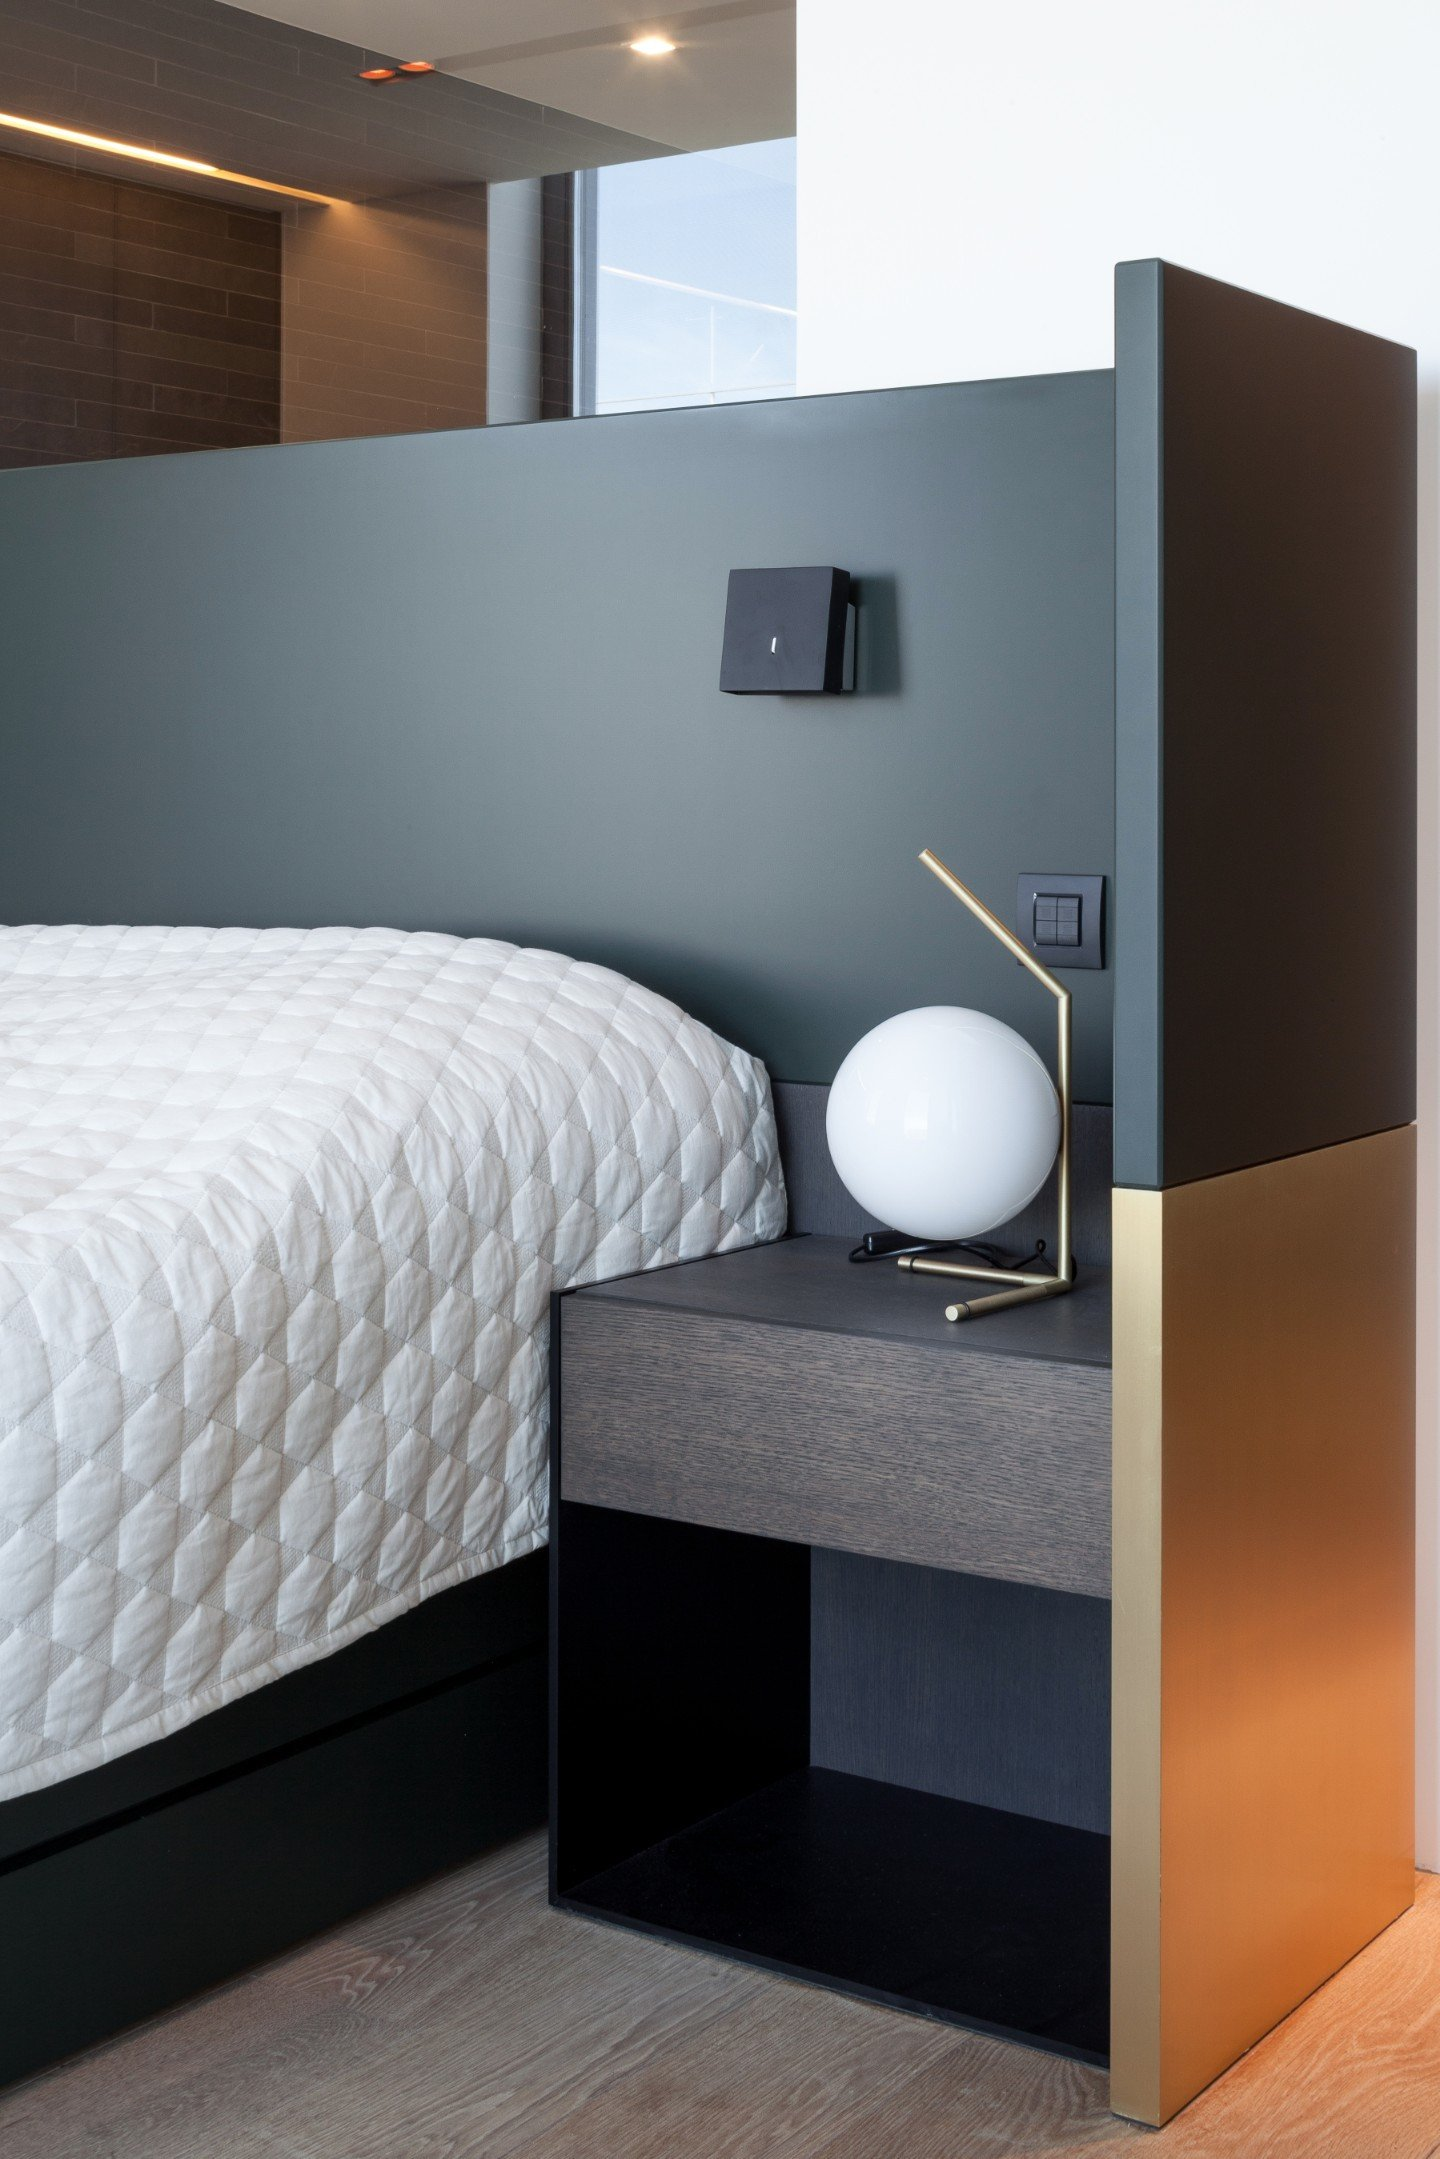 Rietveldprojects-penthouse-appartement-design-architectuur-kust15